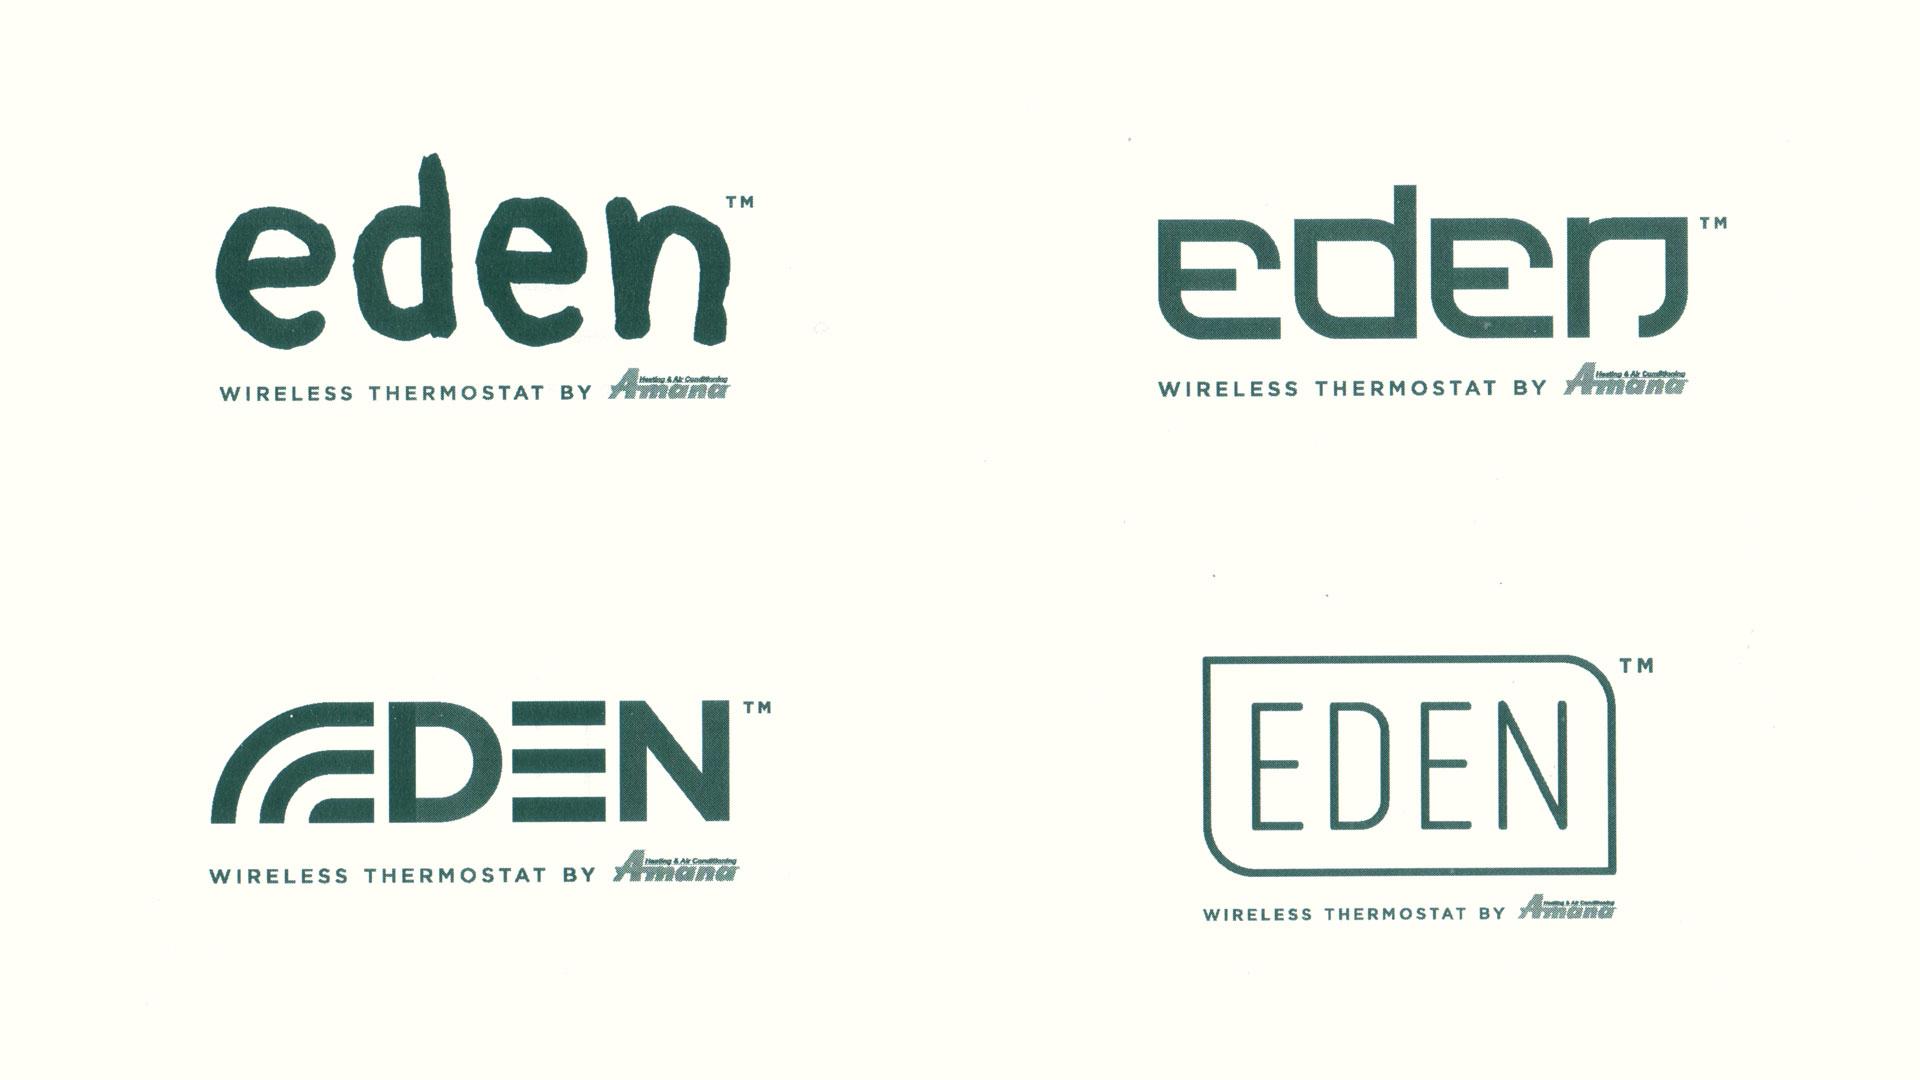 eden-logo-sketches.jpg